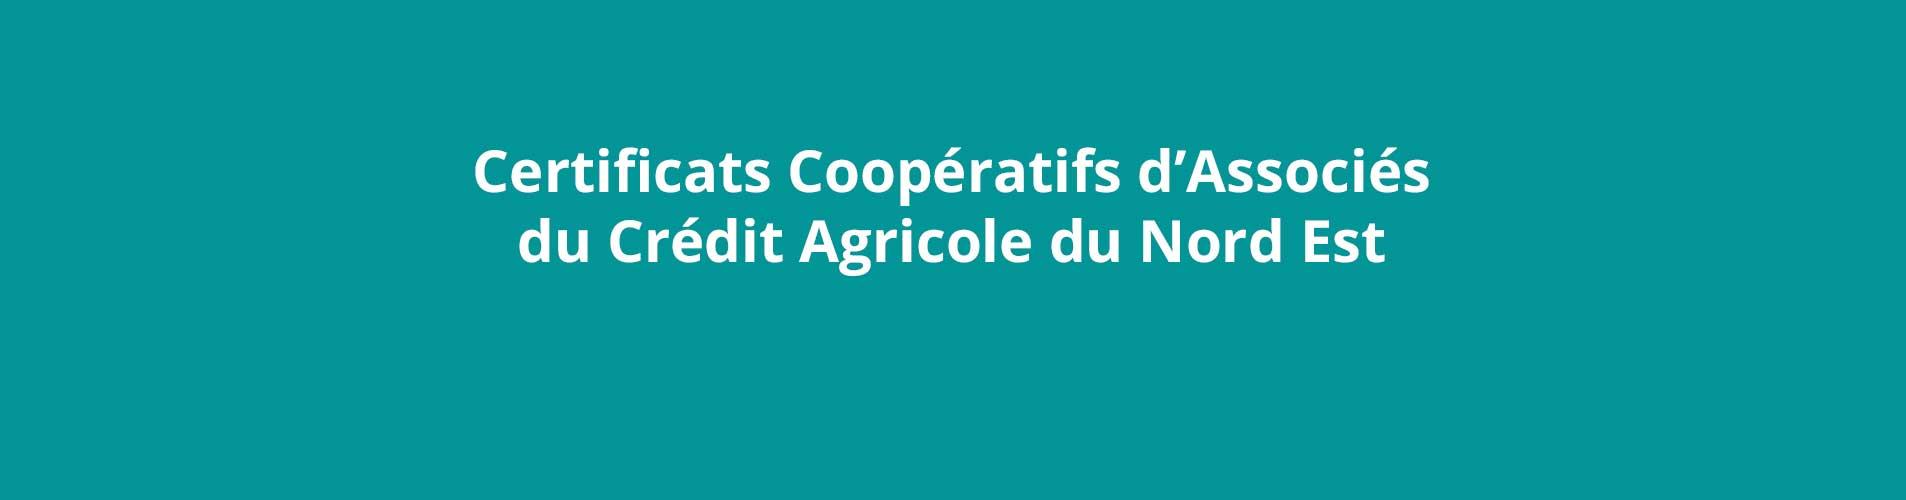 certificats cooperatifs d associes